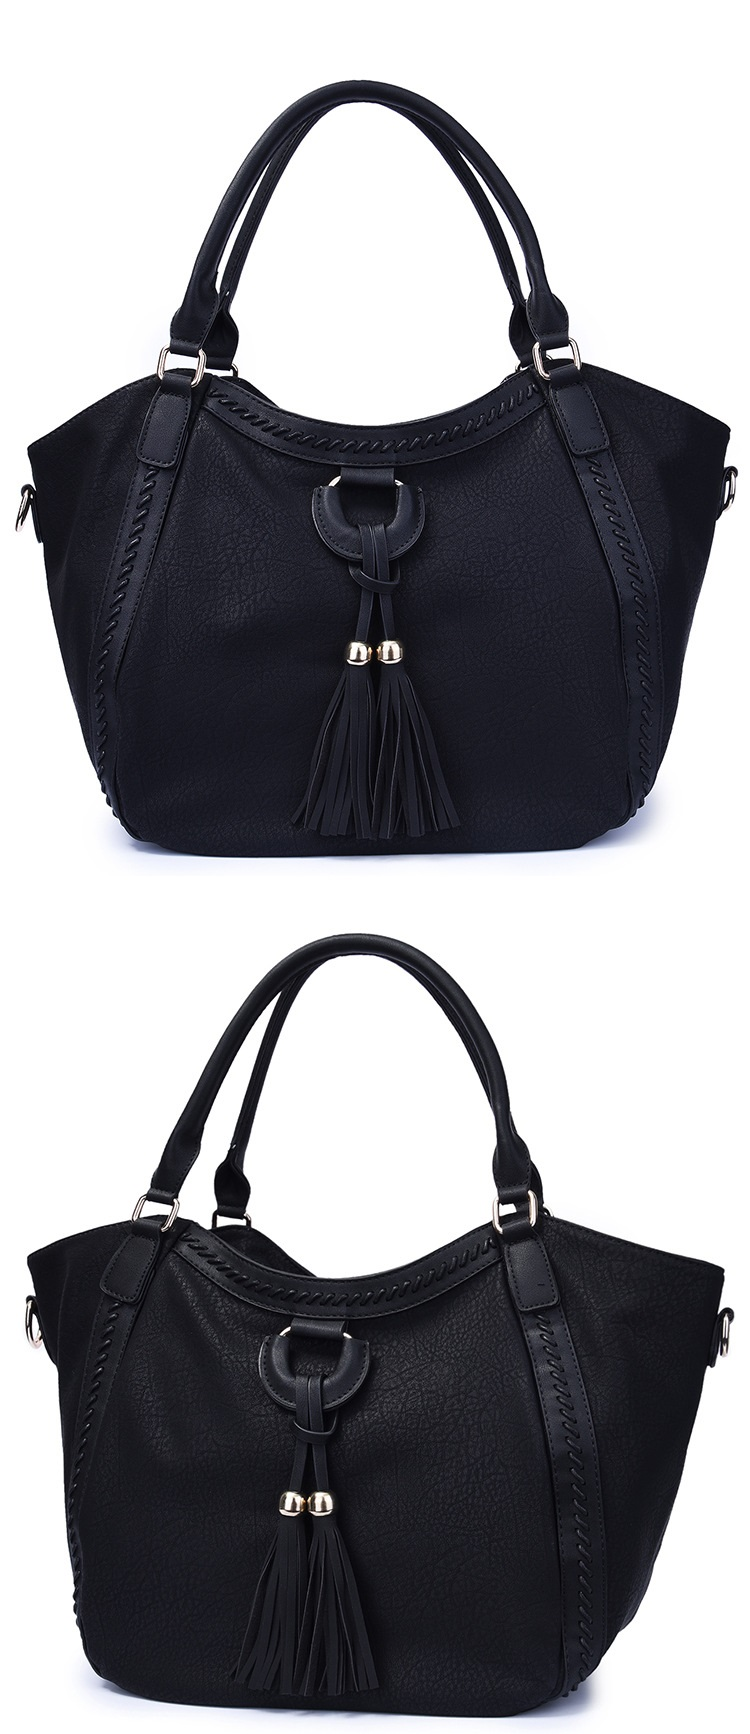 NIGEDU Leather Casual Tassel Handbag Large Famous Brands Designers Pu Leather Handbags Women Big Tote Bags Female Messenger Bags Bolsos Blue (3)